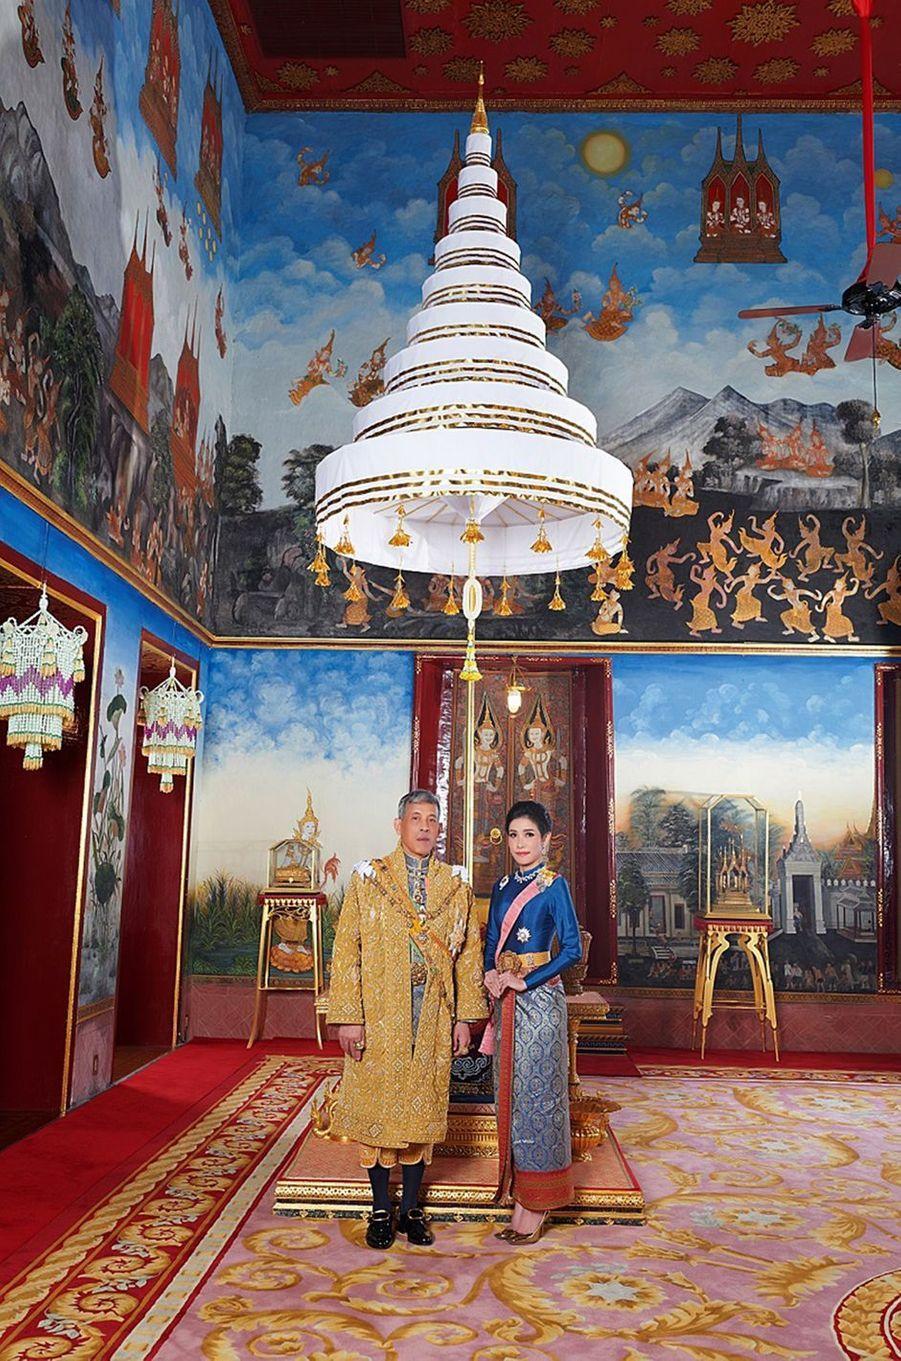 Le roi de Thaïlande Maha Vajiralongkorn (Rama X) avec Sineenat Bilaskalayani, sa concubine officielle. Photo diffusée le 26 août 2019 par le Palais royal de Thaïlande